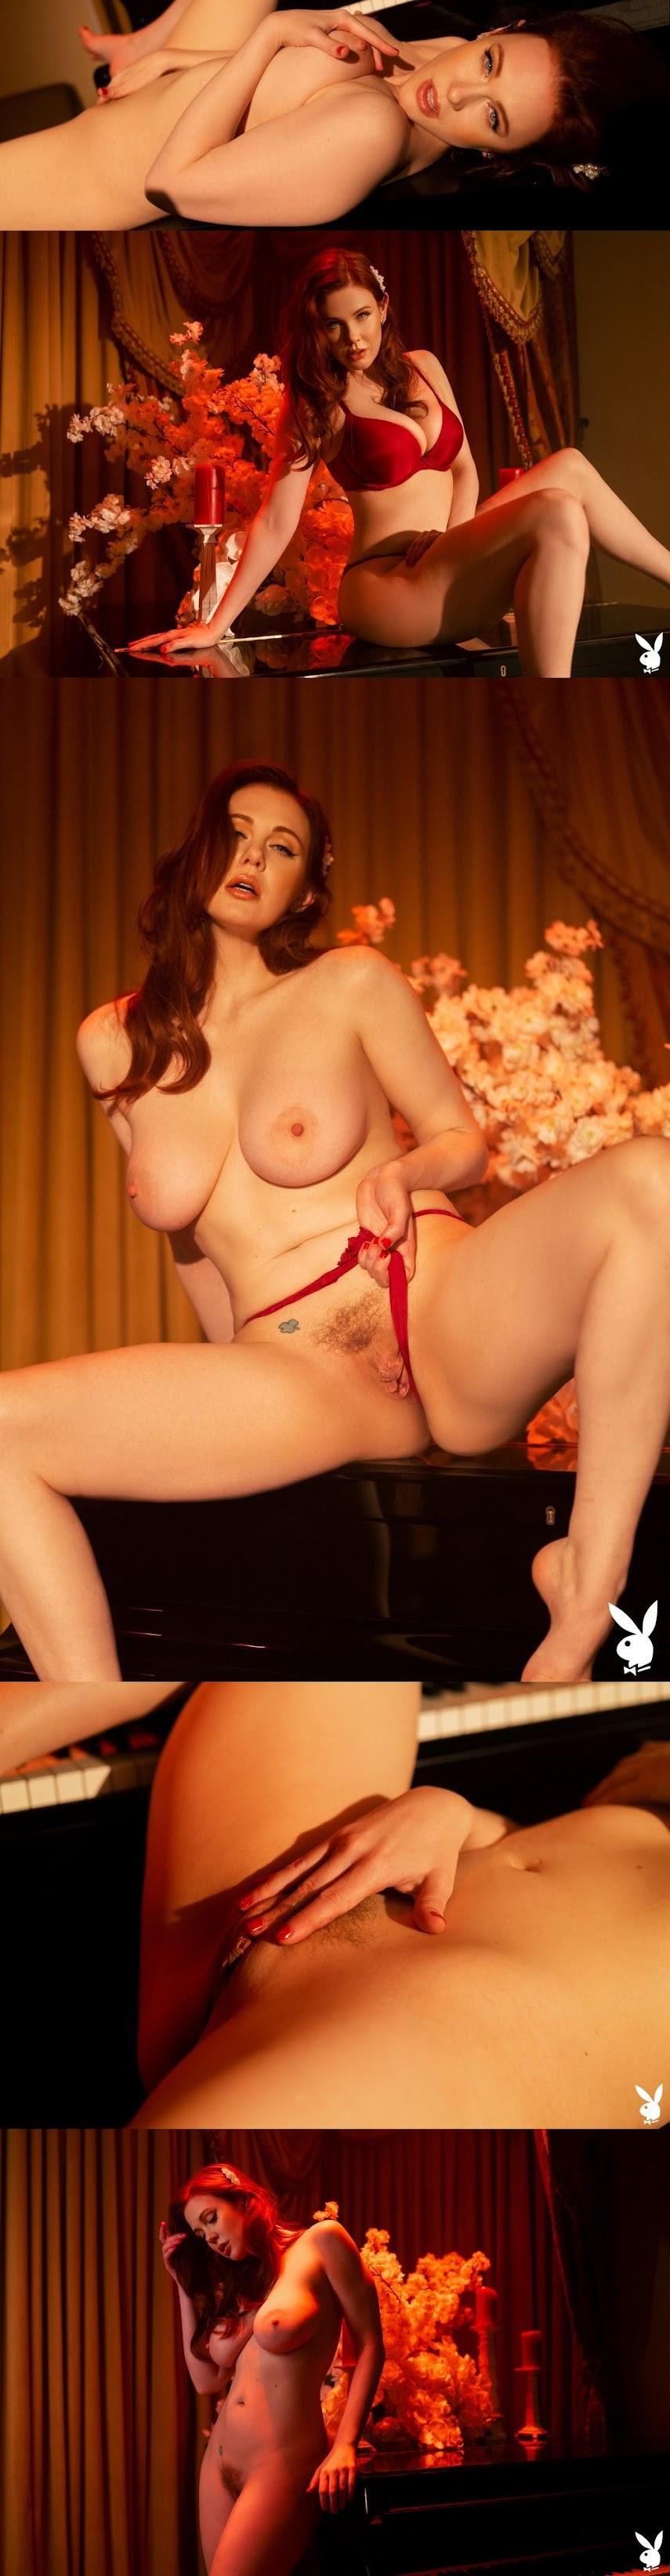 1634310612_maitland09_0016 1-[Playboy Plus] Maitland Ward in Intimate Melody playboy-plus 10190